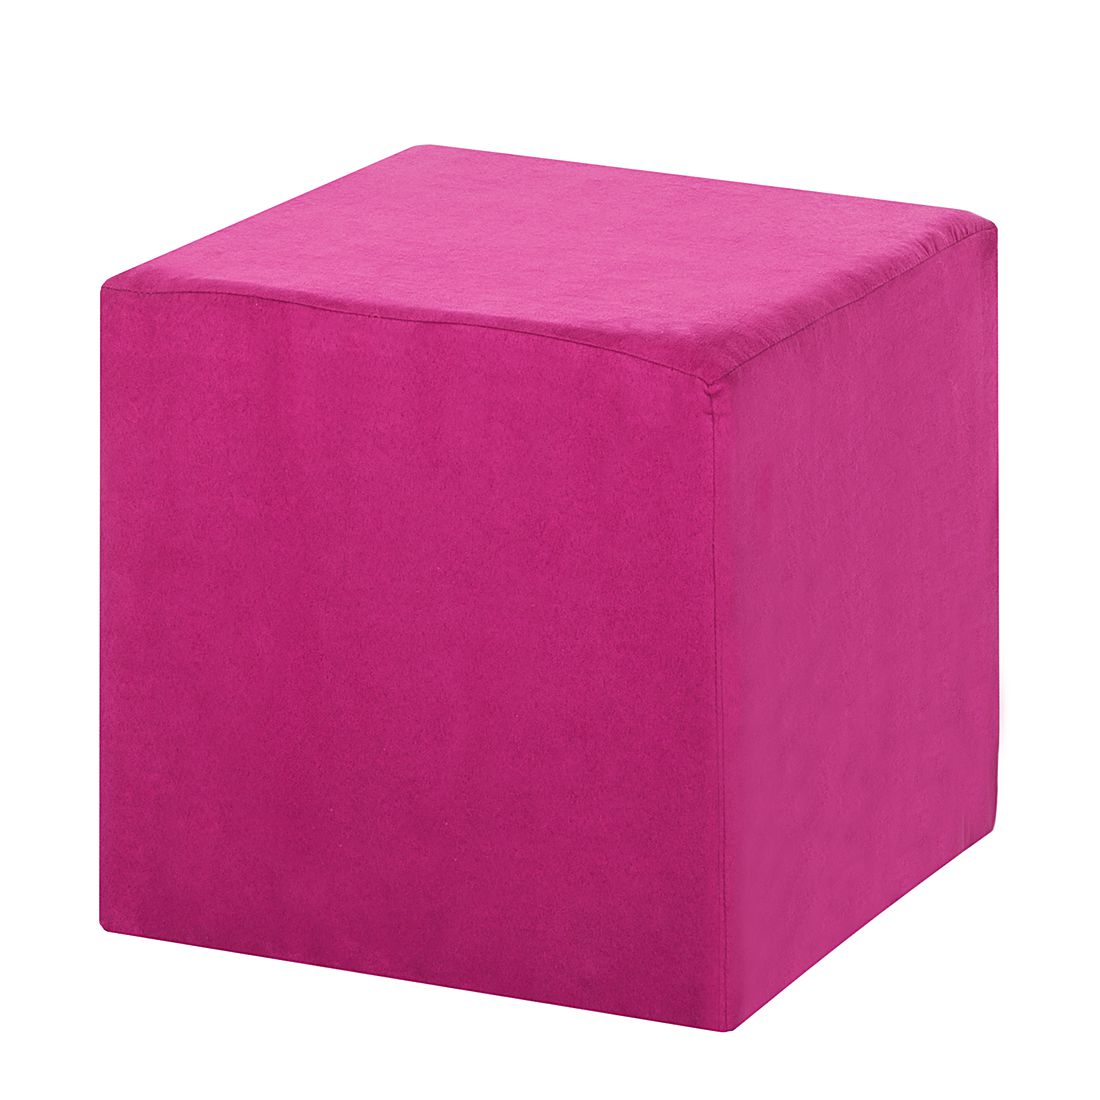 Sitzwürfel Fredrik – Stoff Pink, Fredriks günstig kaufen